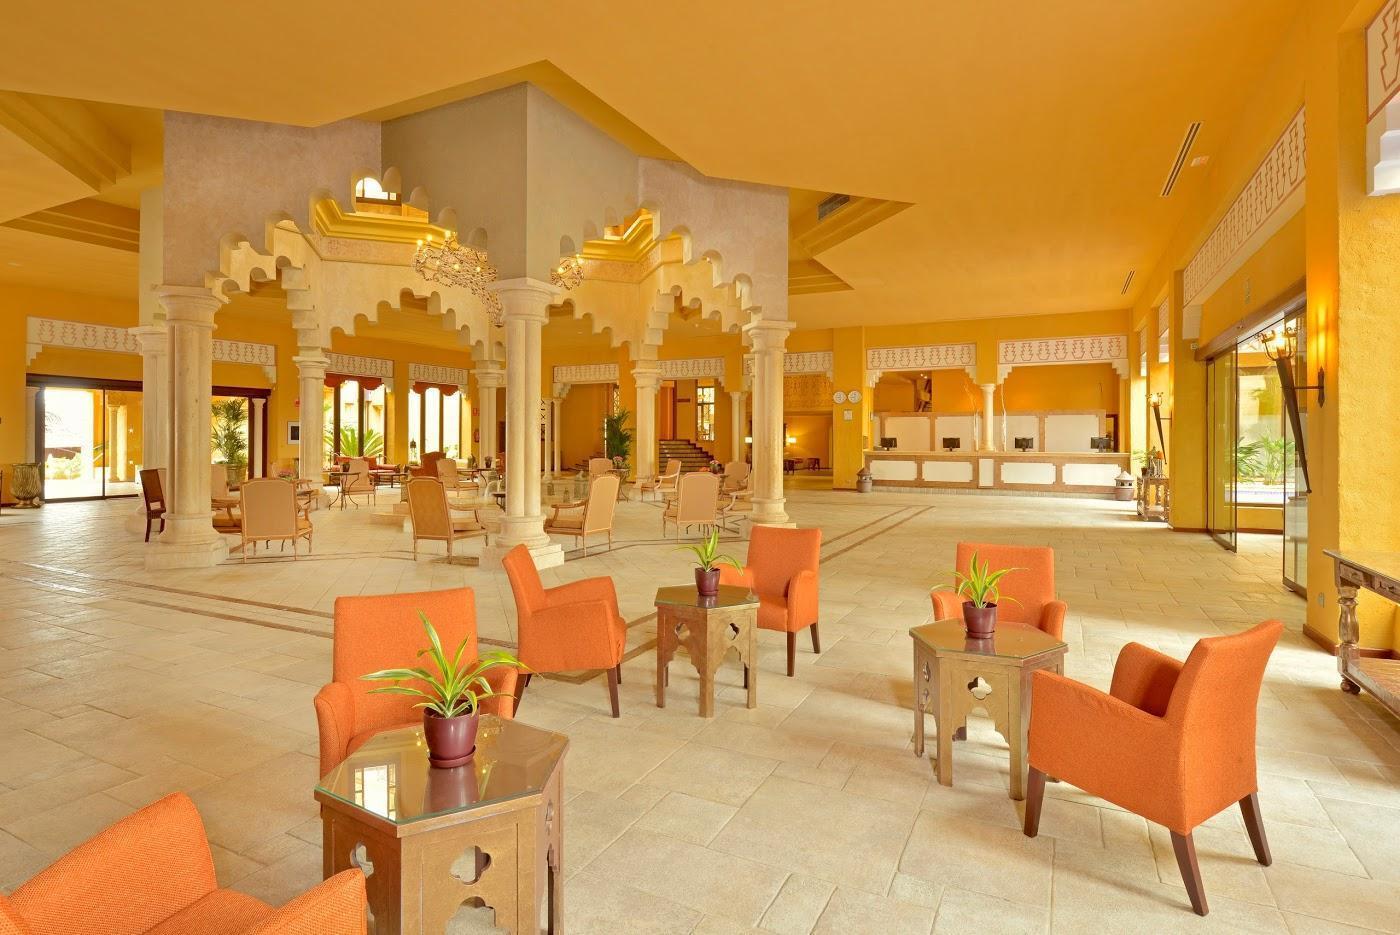 hotel hotel iberostar isla canela en isla canela viajes carrefour. Black Bedroom Furniture Sets. Home Design Ideas